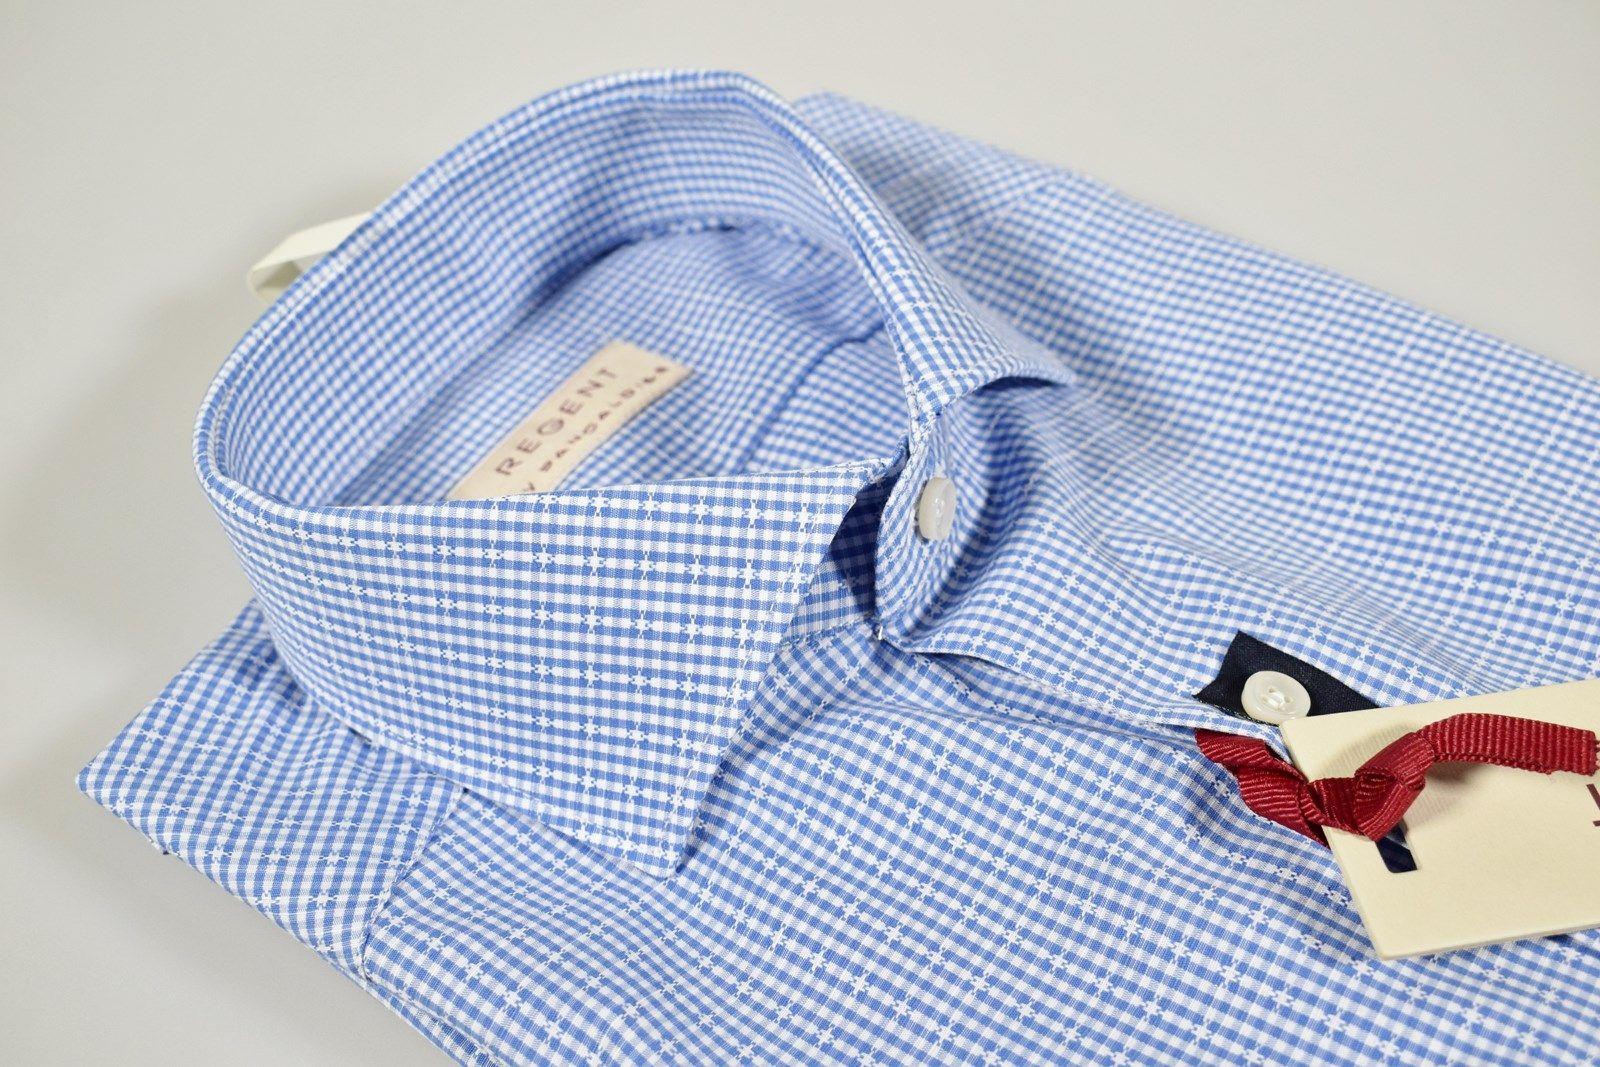 innovative design 28bc1 610c6 Blue checkered shirt regent by pancaldi slim fit spread ...